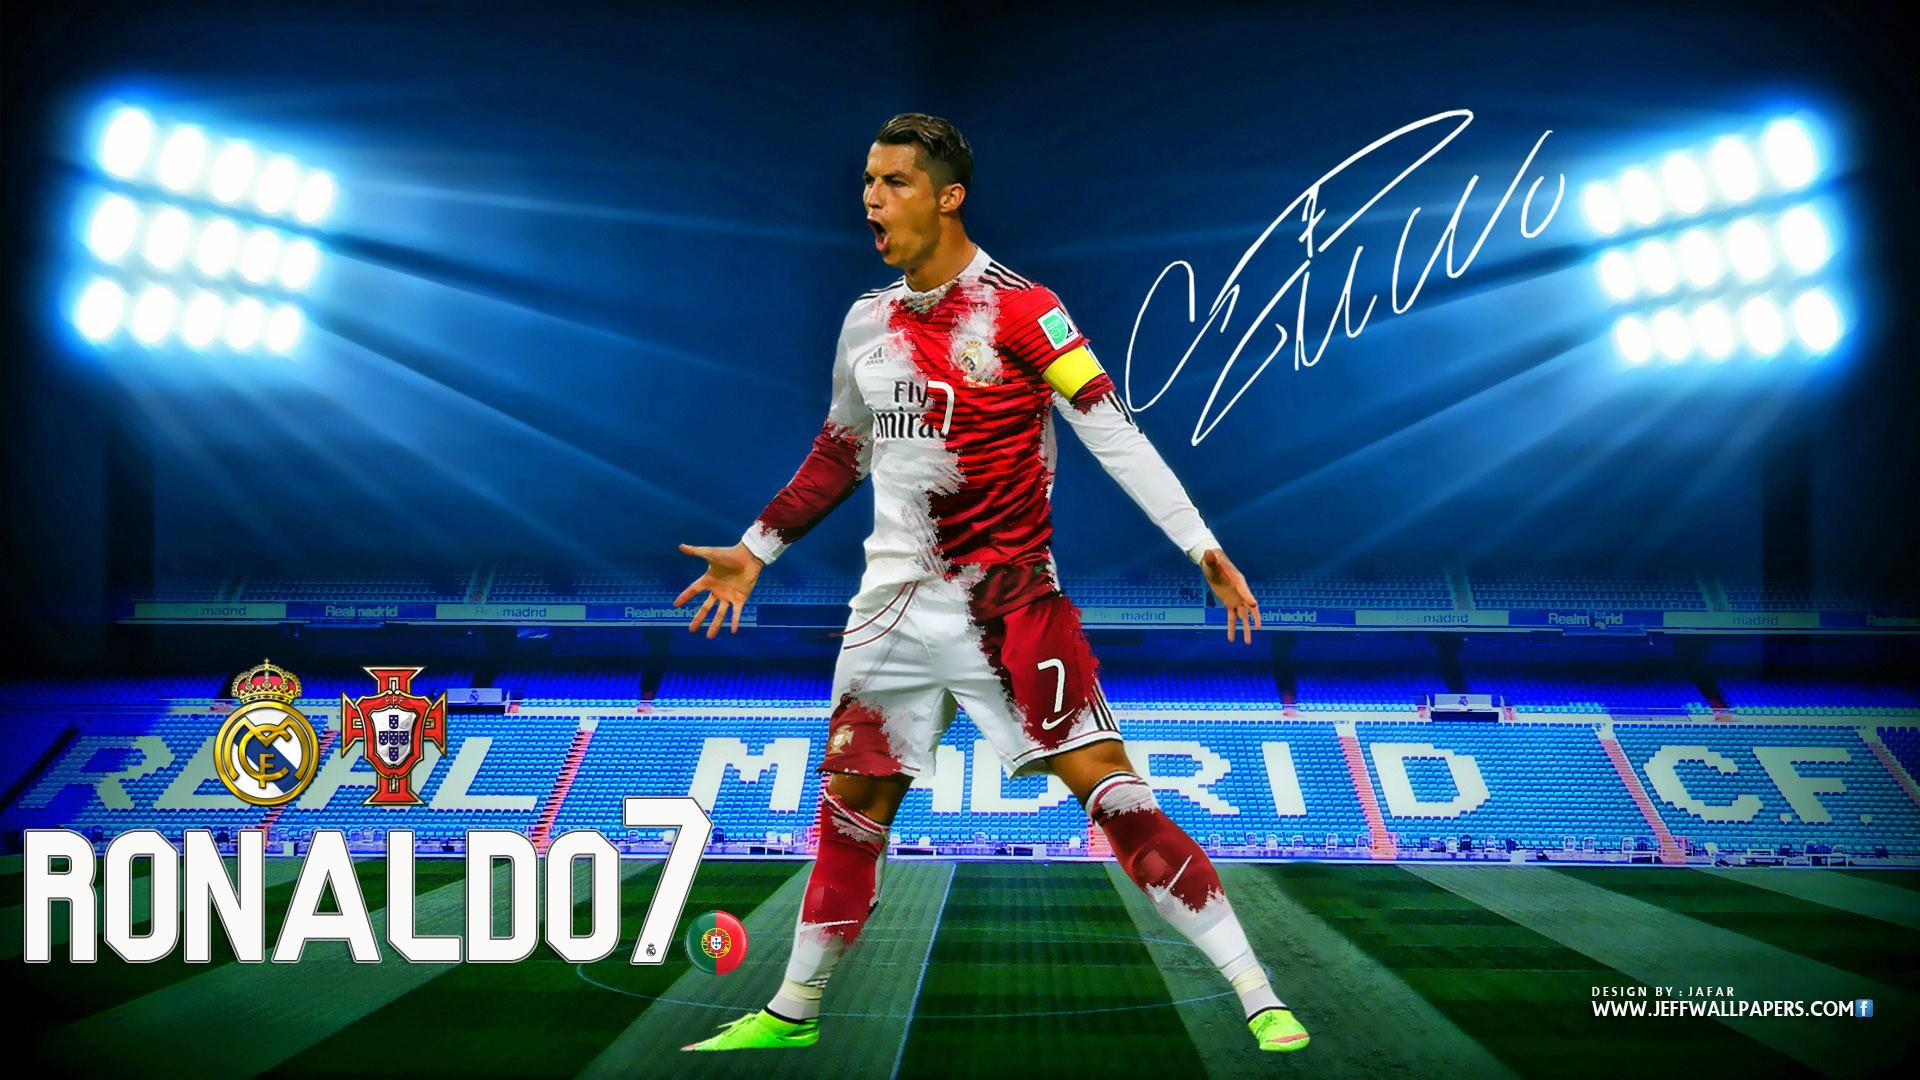 Download Cristiano Ronaldo CR7 Real Madrid Kit 2015 HD Wallpaper 1920x1080